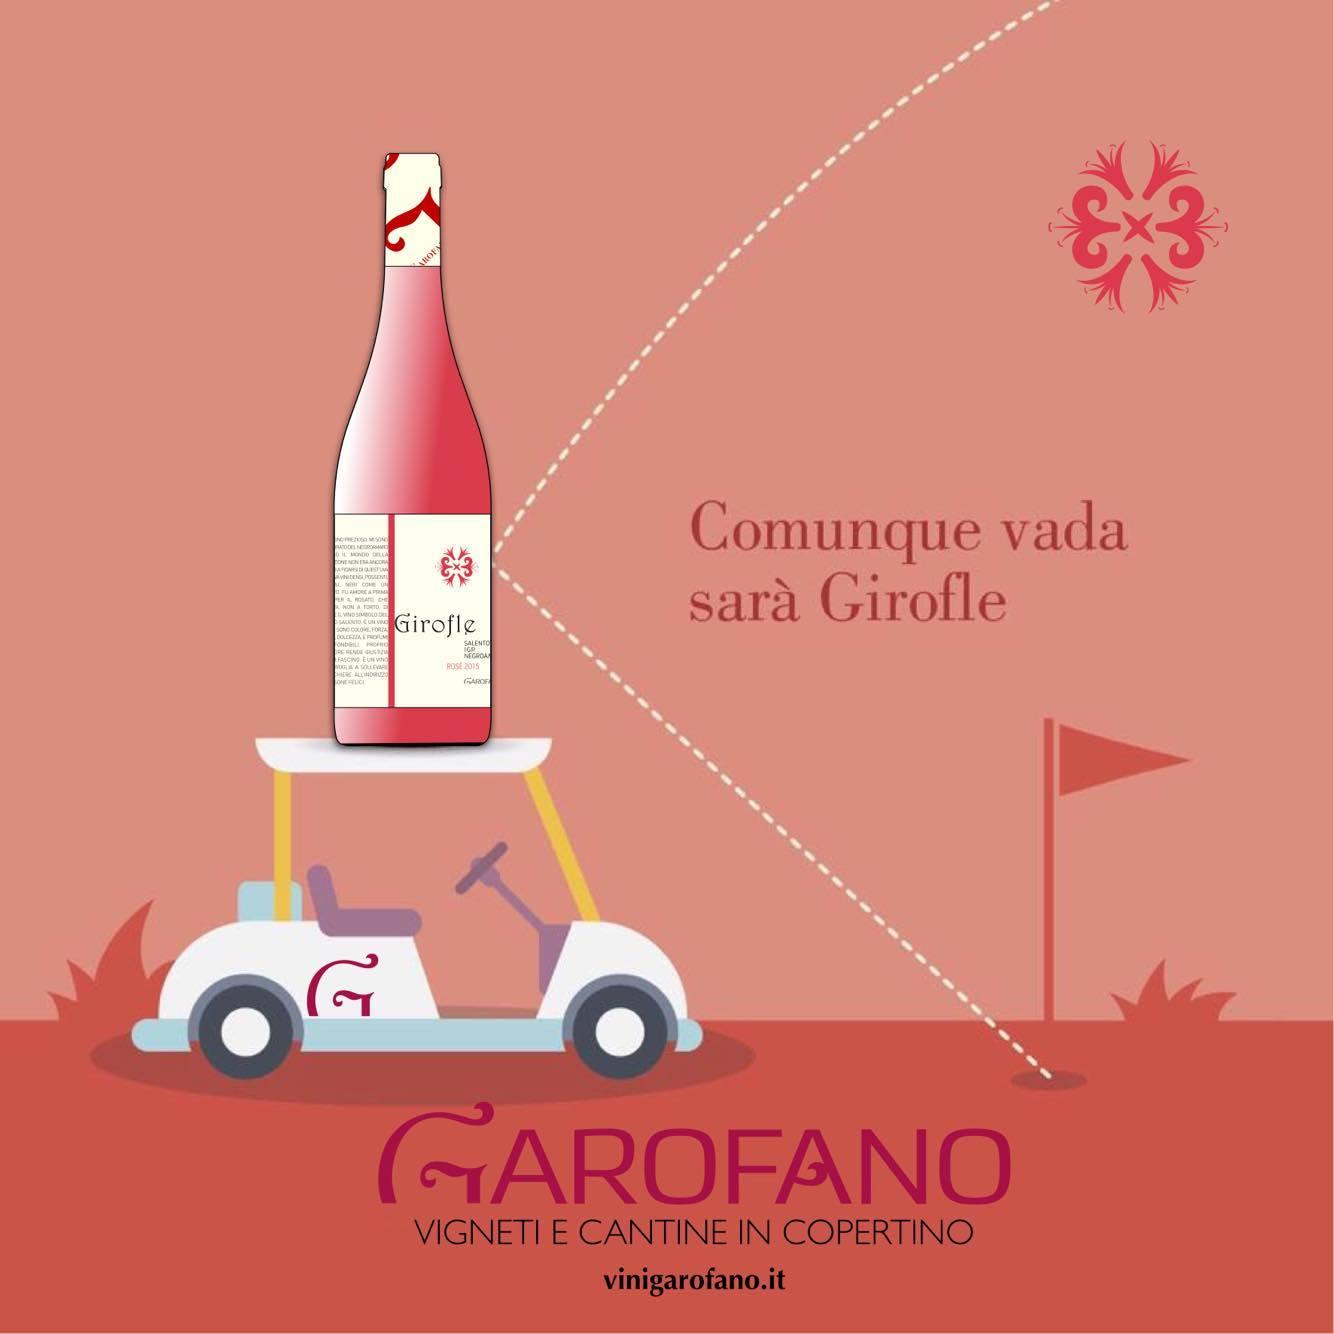 Girofle Gaggia Cup Milano